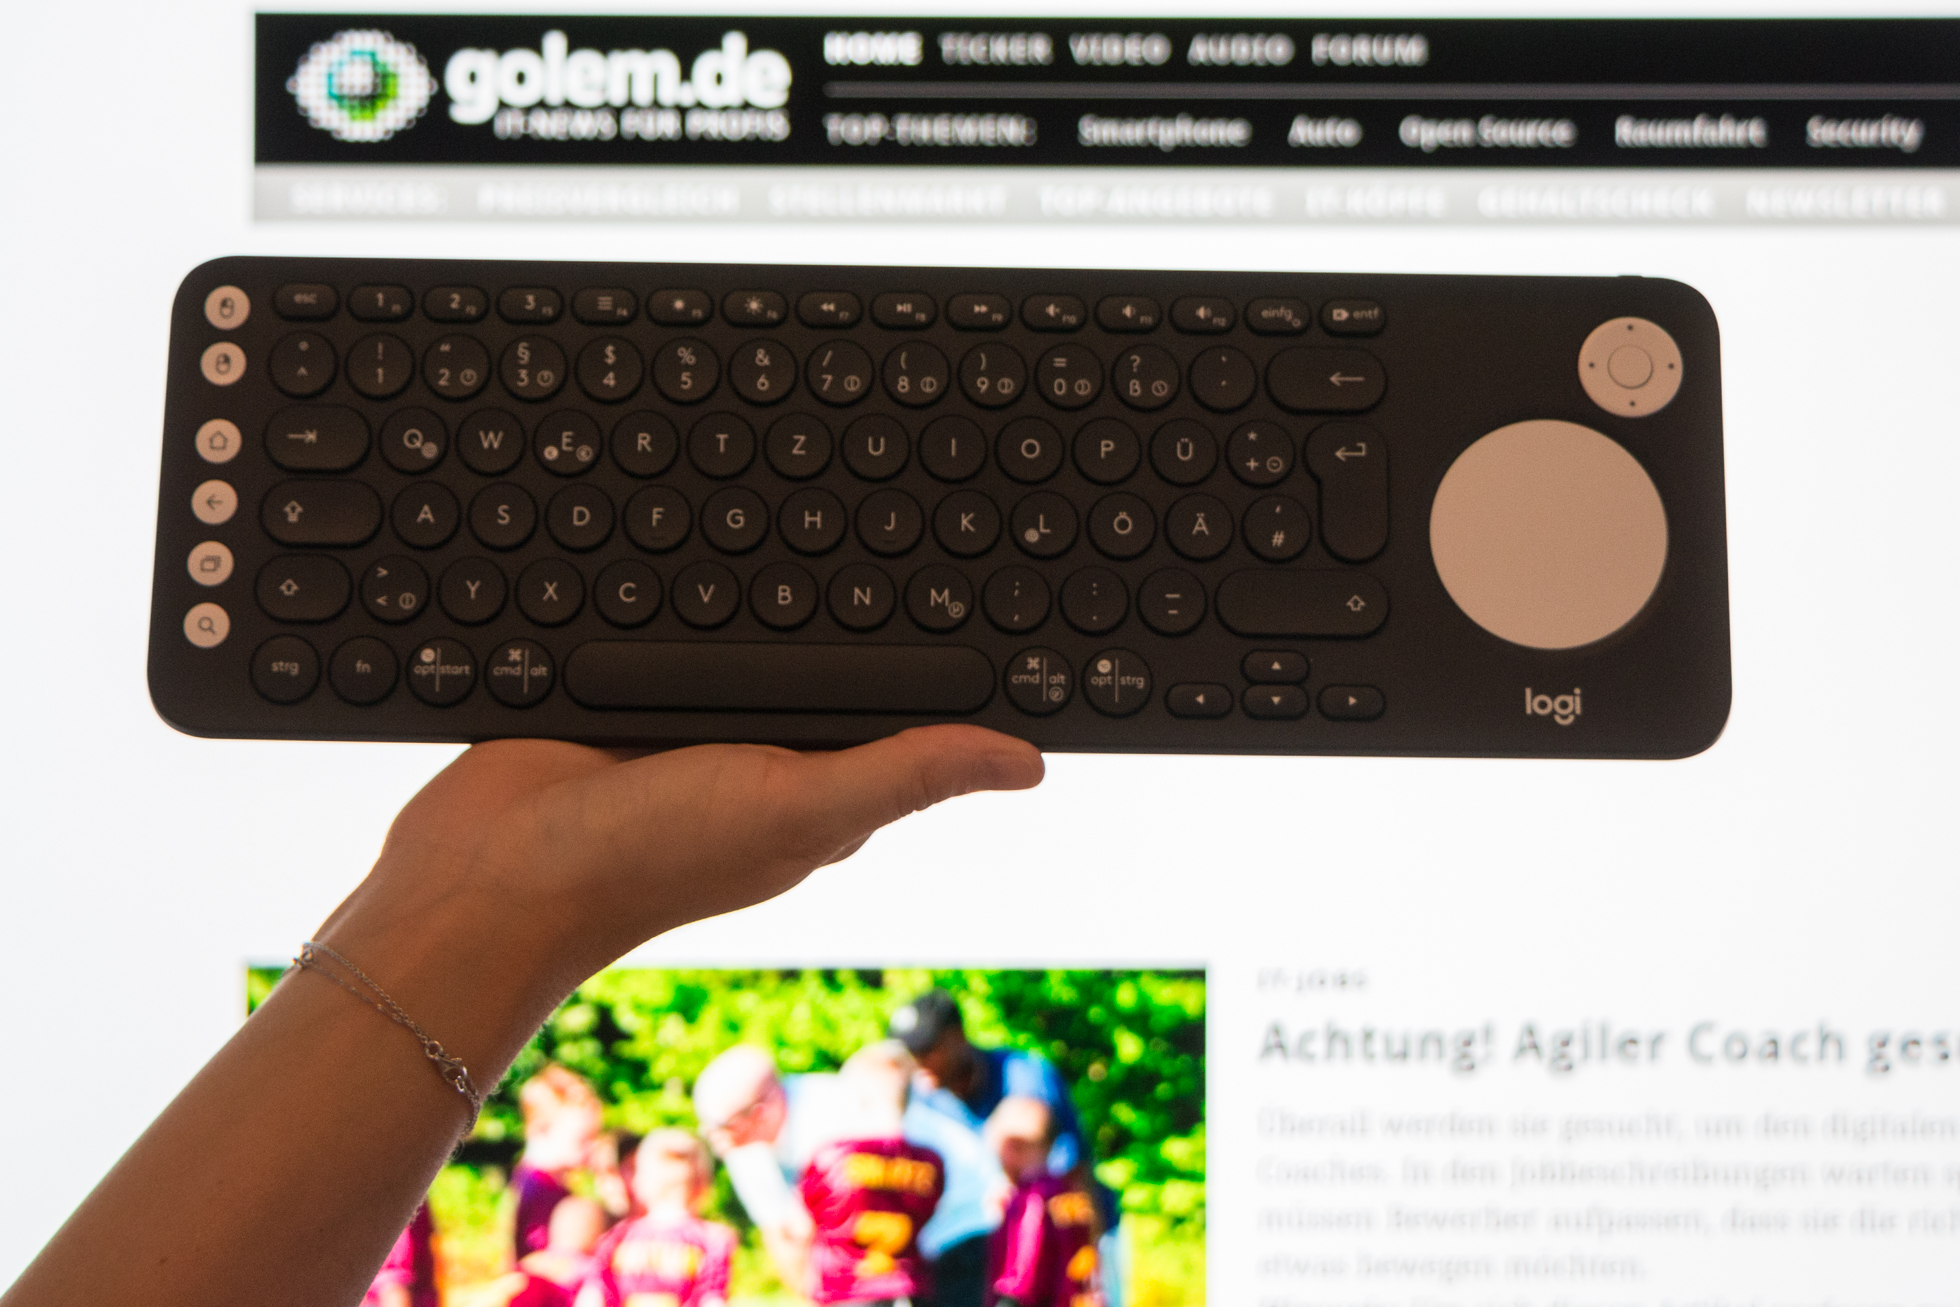 Logitech K600 TV: Drahtlose Tastatur für Smart-TVs und Streaming-Geräte - Logitechs drahtlose Tastatur K600 TV (Bild: Werner Pluta/Golem.de)